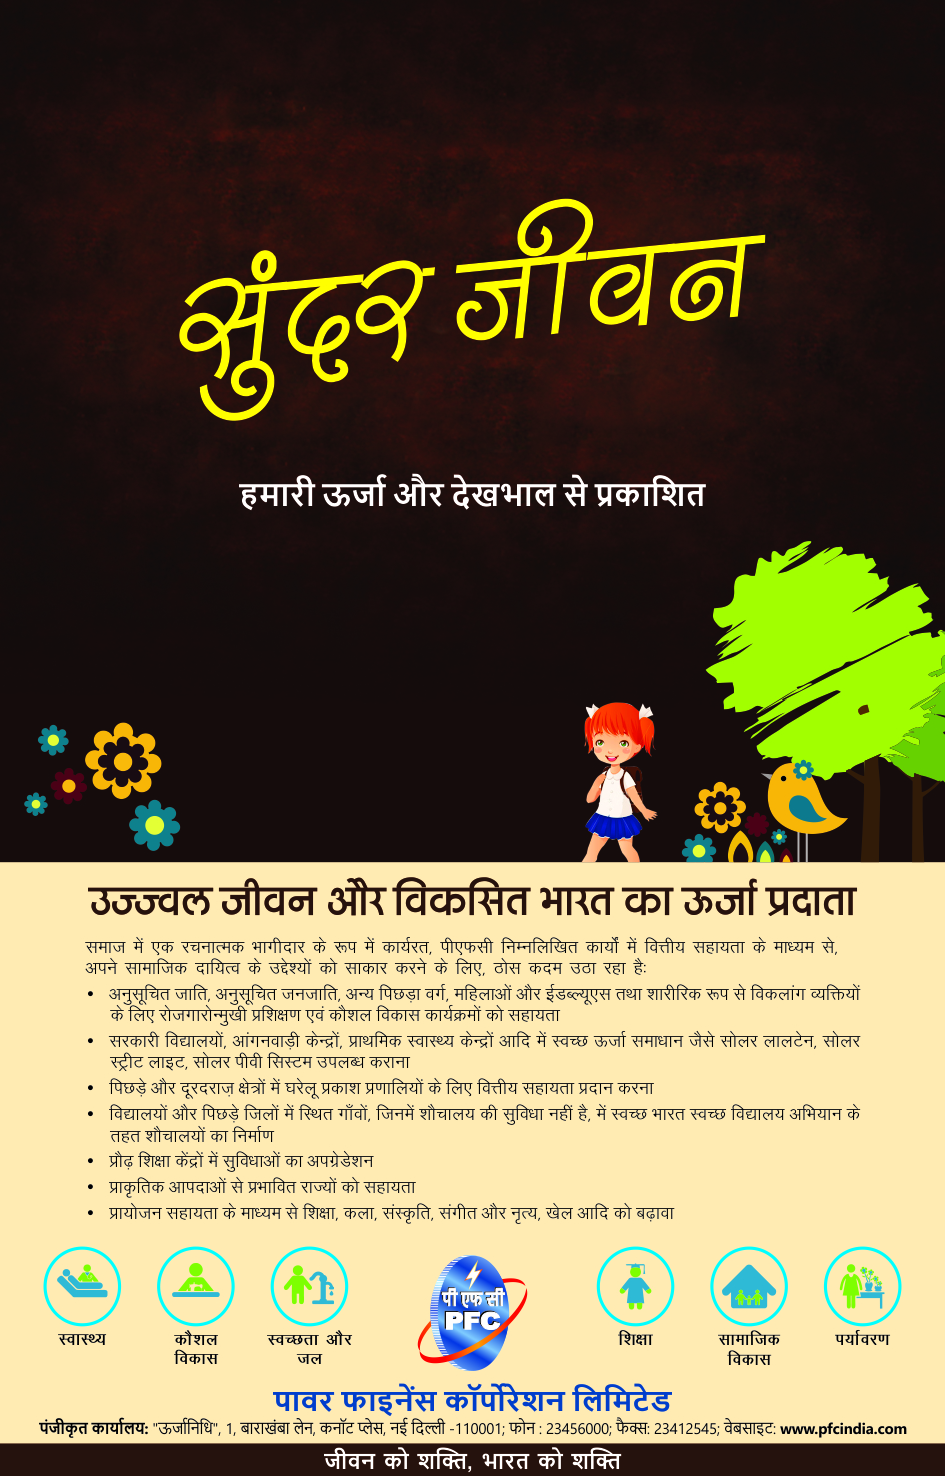 Advt_Hindi_ad2 (1)